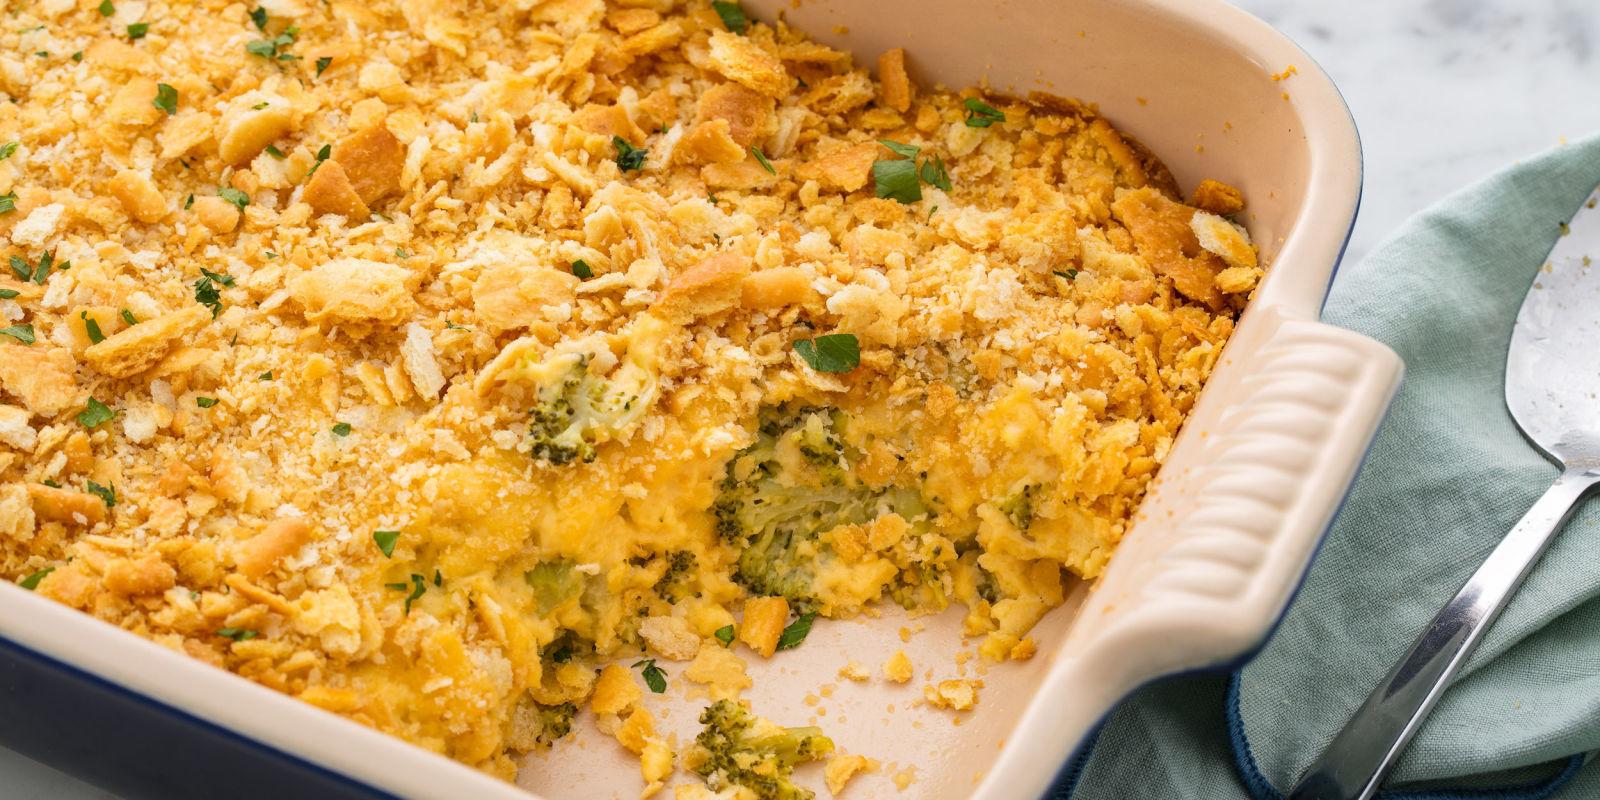 Easy Broccoli Cheese Casserole Recipe - How to Make Cheesy ...